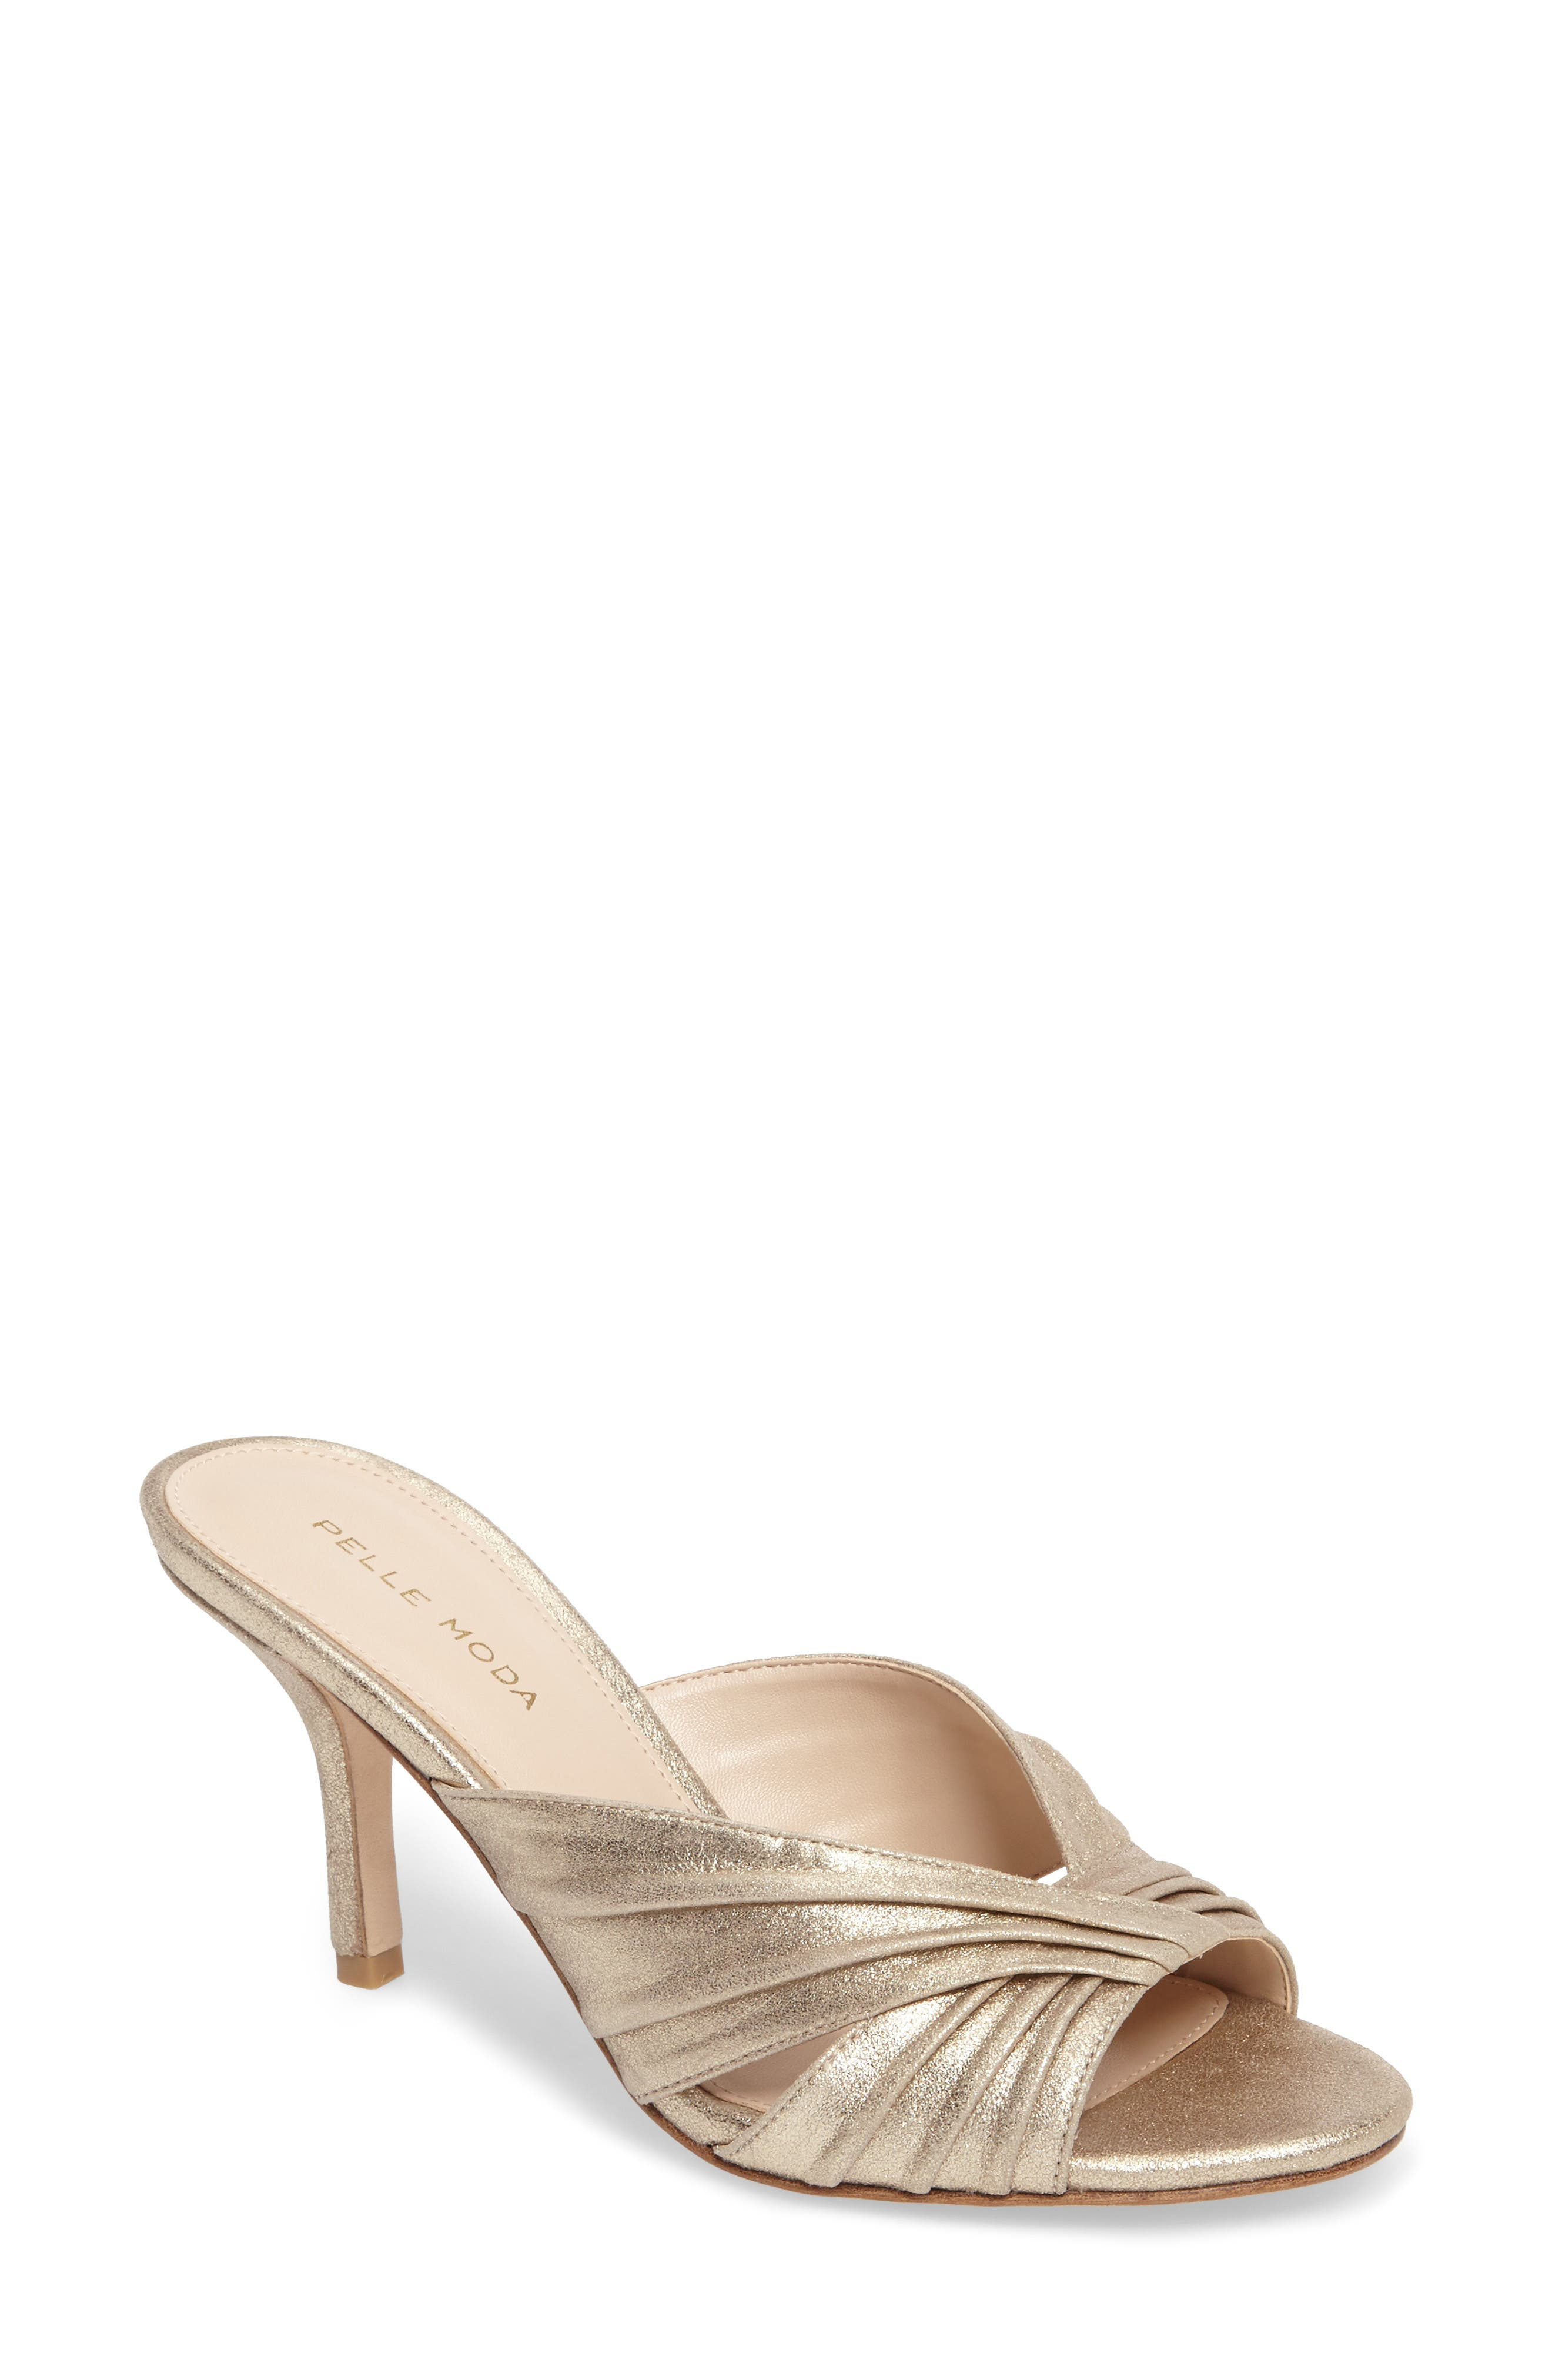 Isla Sandal,                             Main thumbnail 1, color,                             Platinum Gold Leather